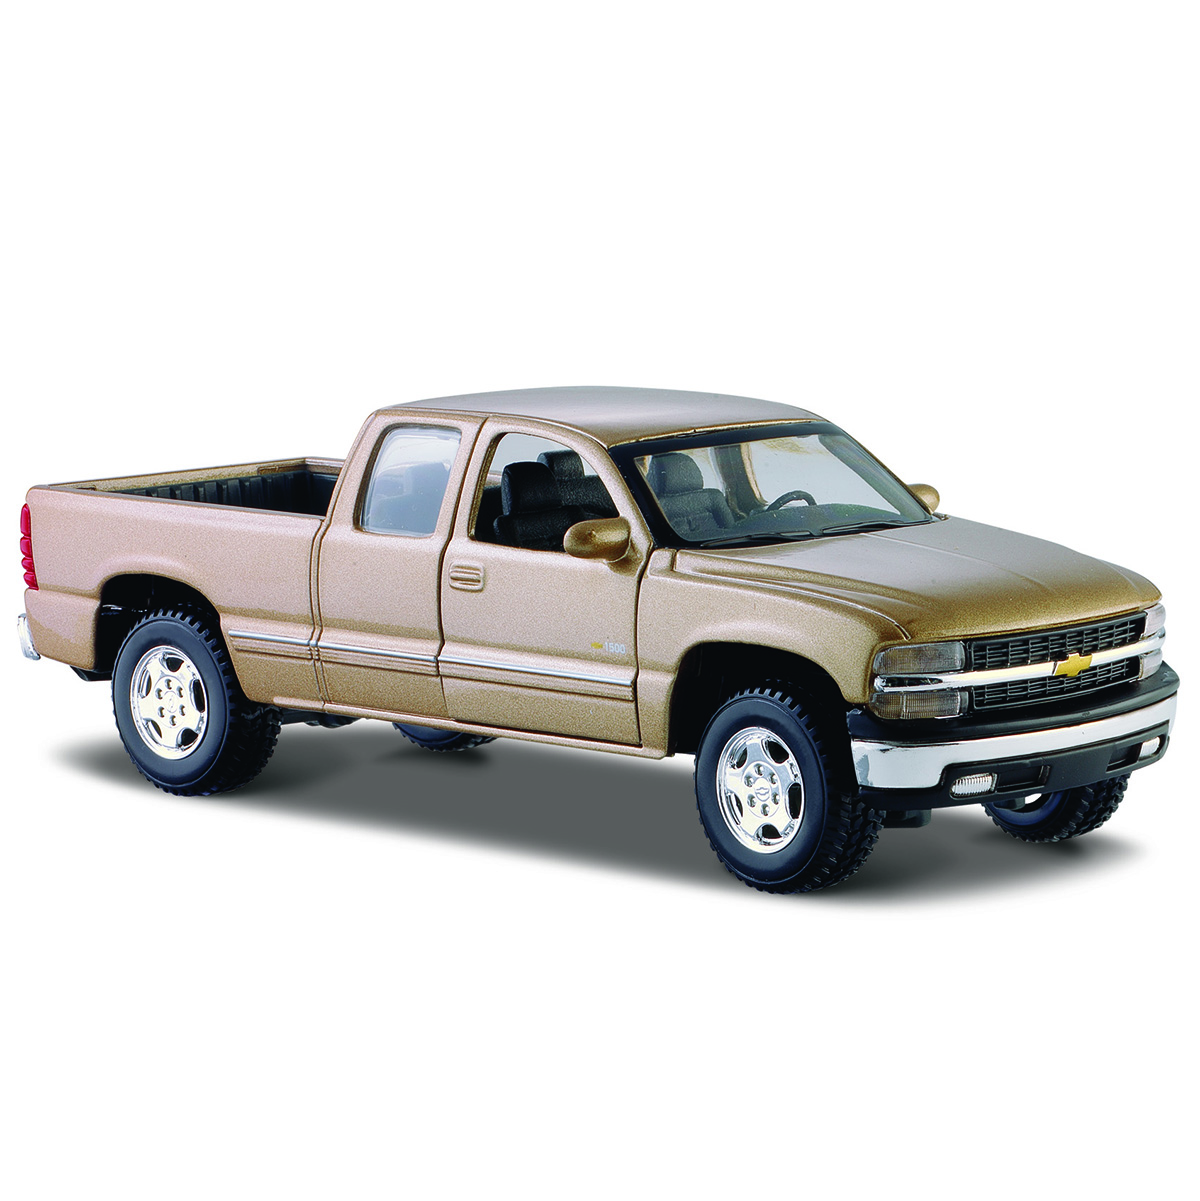 Модель машины - Chevrolet Silverado 1998, 1:24 фото